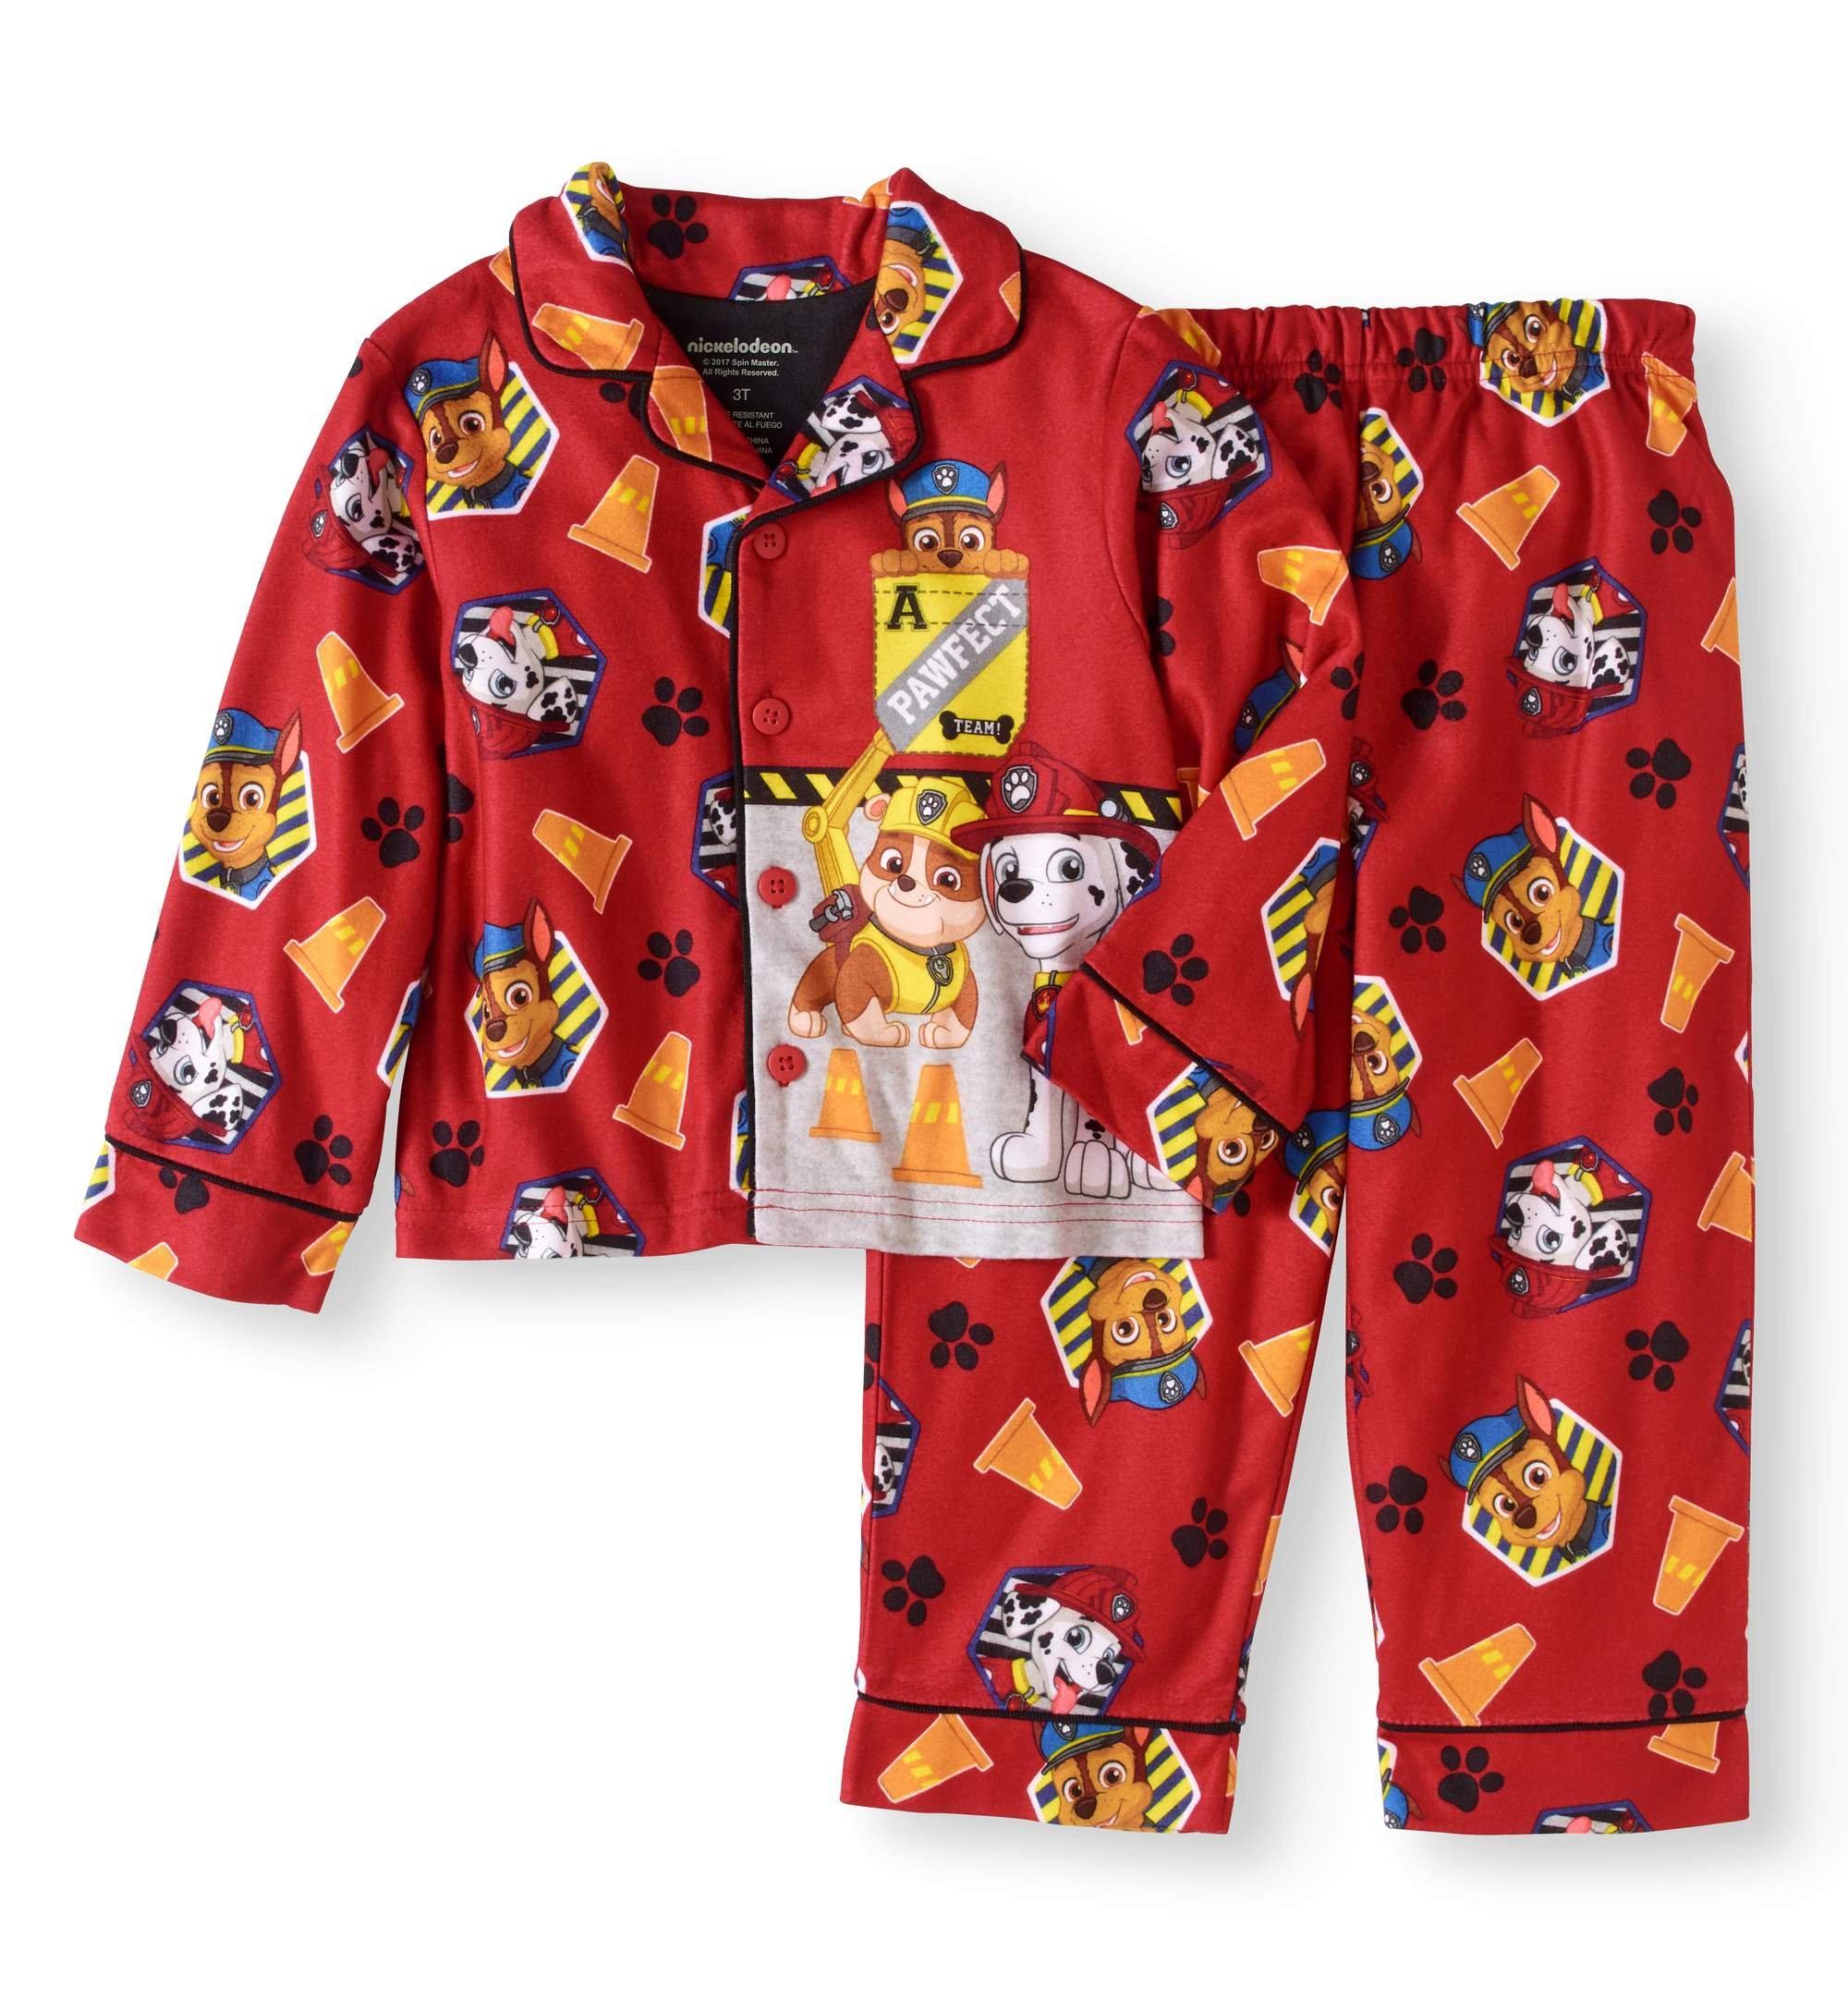 Paw Patrol 2 Piece Pajama Set for Toddlers (2T)